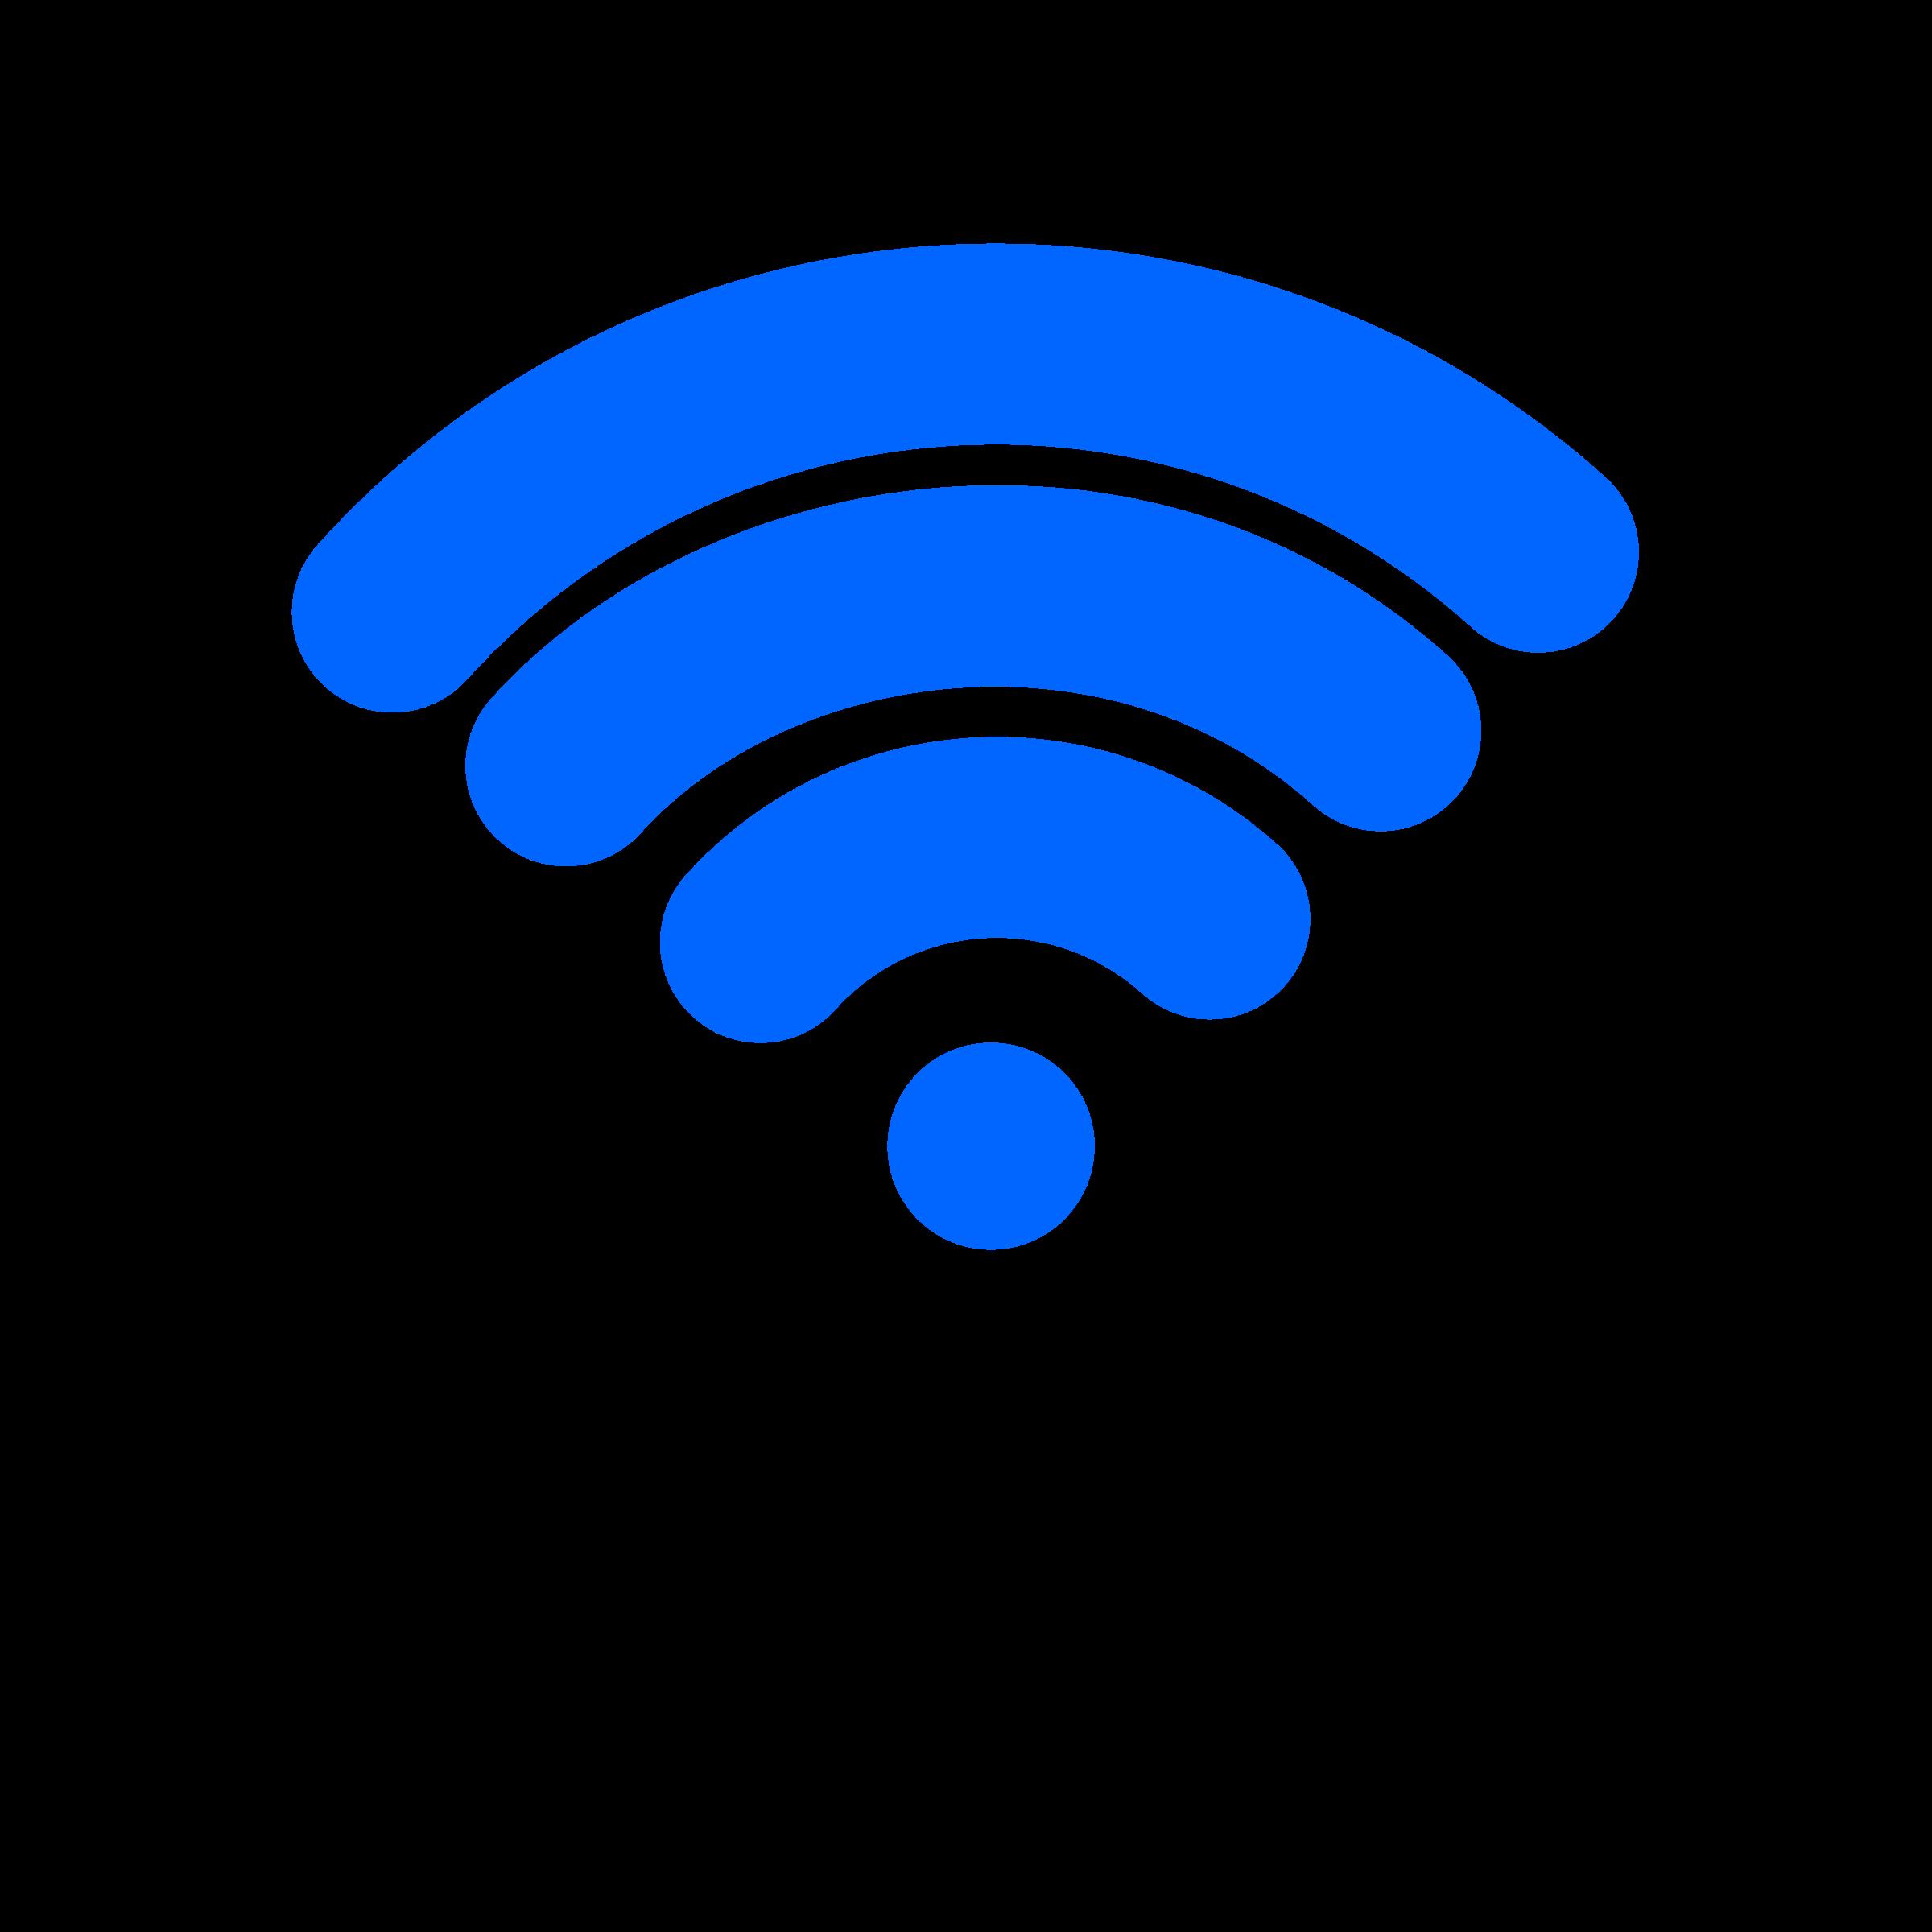 Free Wifi Symbol Cliparts, Download Free Clip Art, Free Clip Art on.